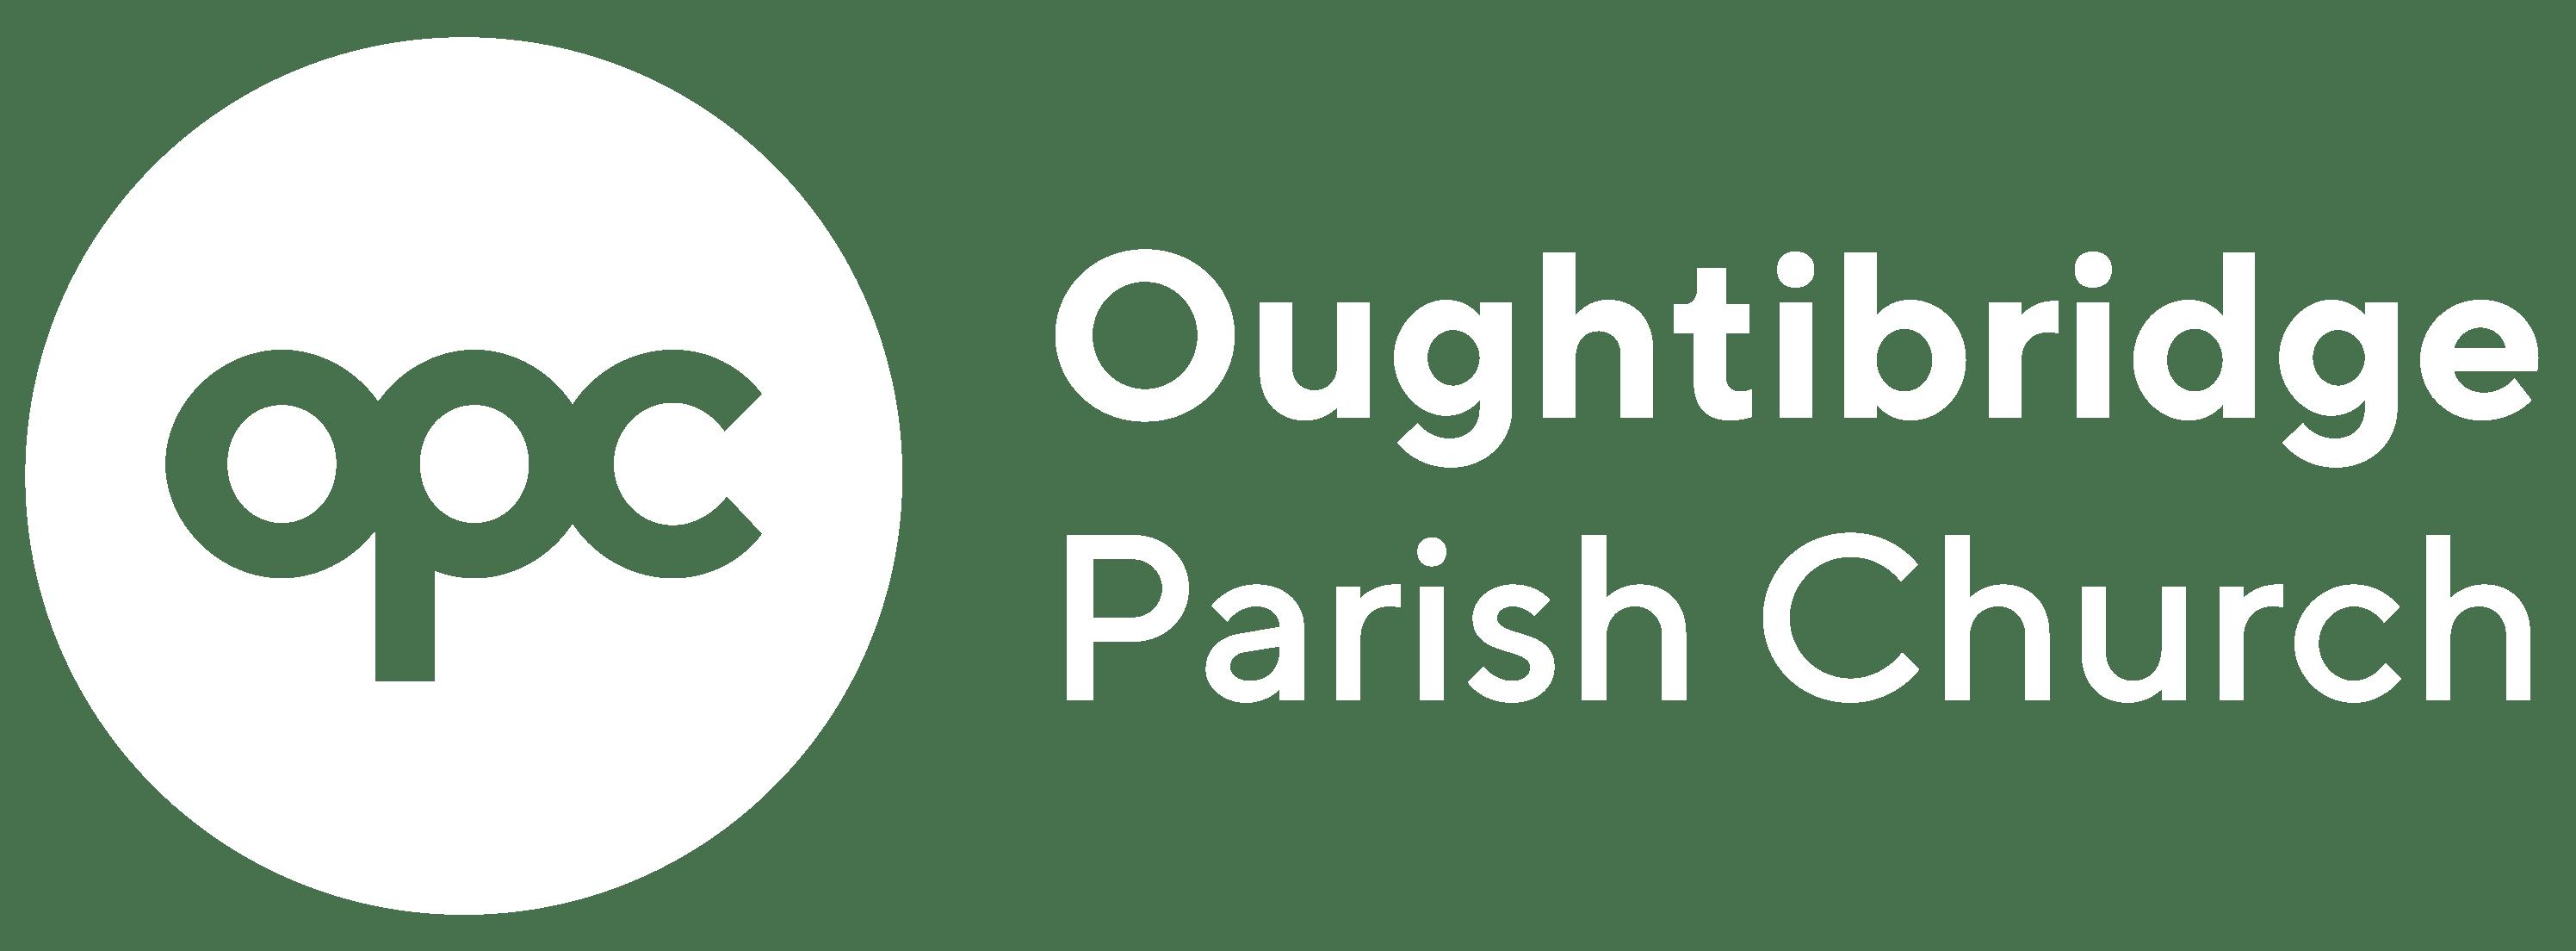 Oughtibridge Parish Church